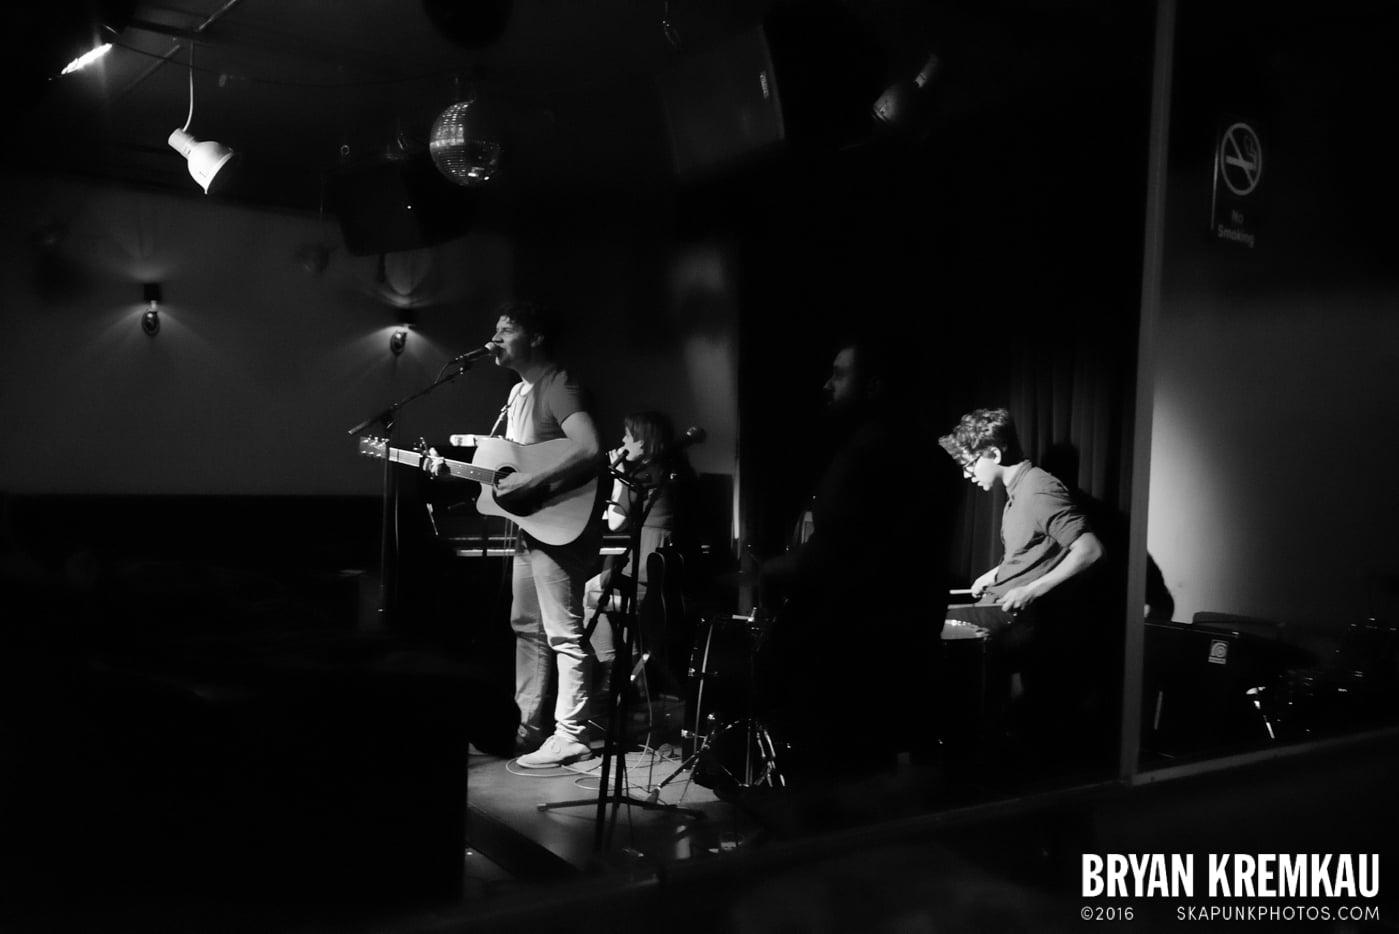 Jordan Klassen @ Bowery Electric, NYC - 10.9.13 (10)